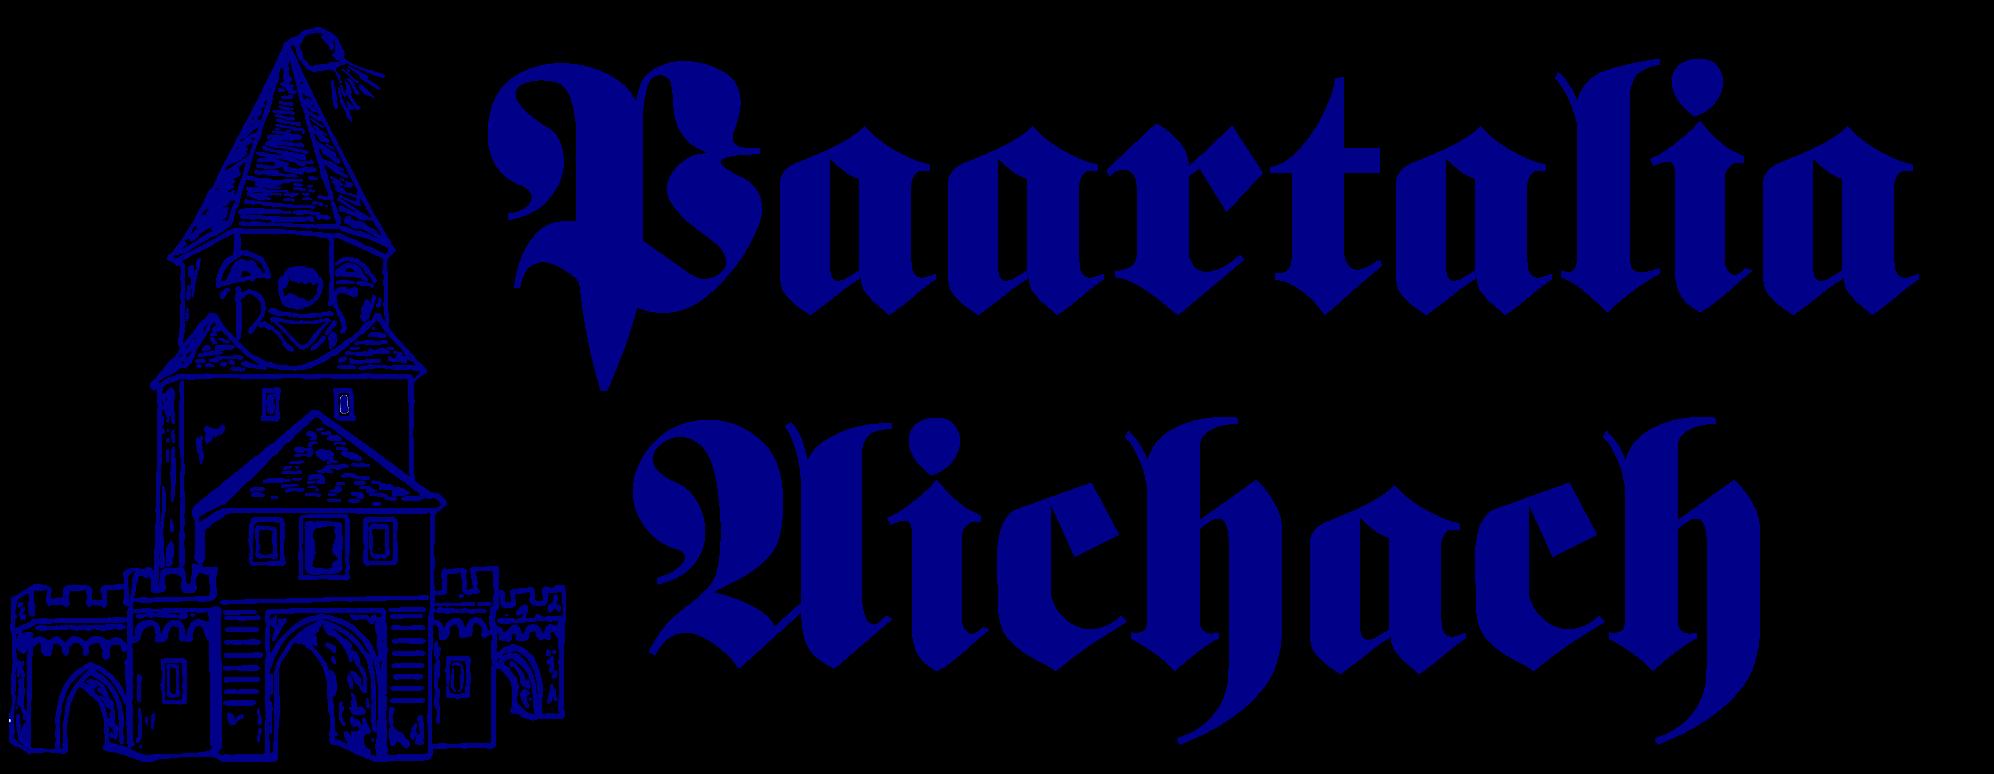 Faschingsgesellschaft Paartalia Aichach 1973 e. V.